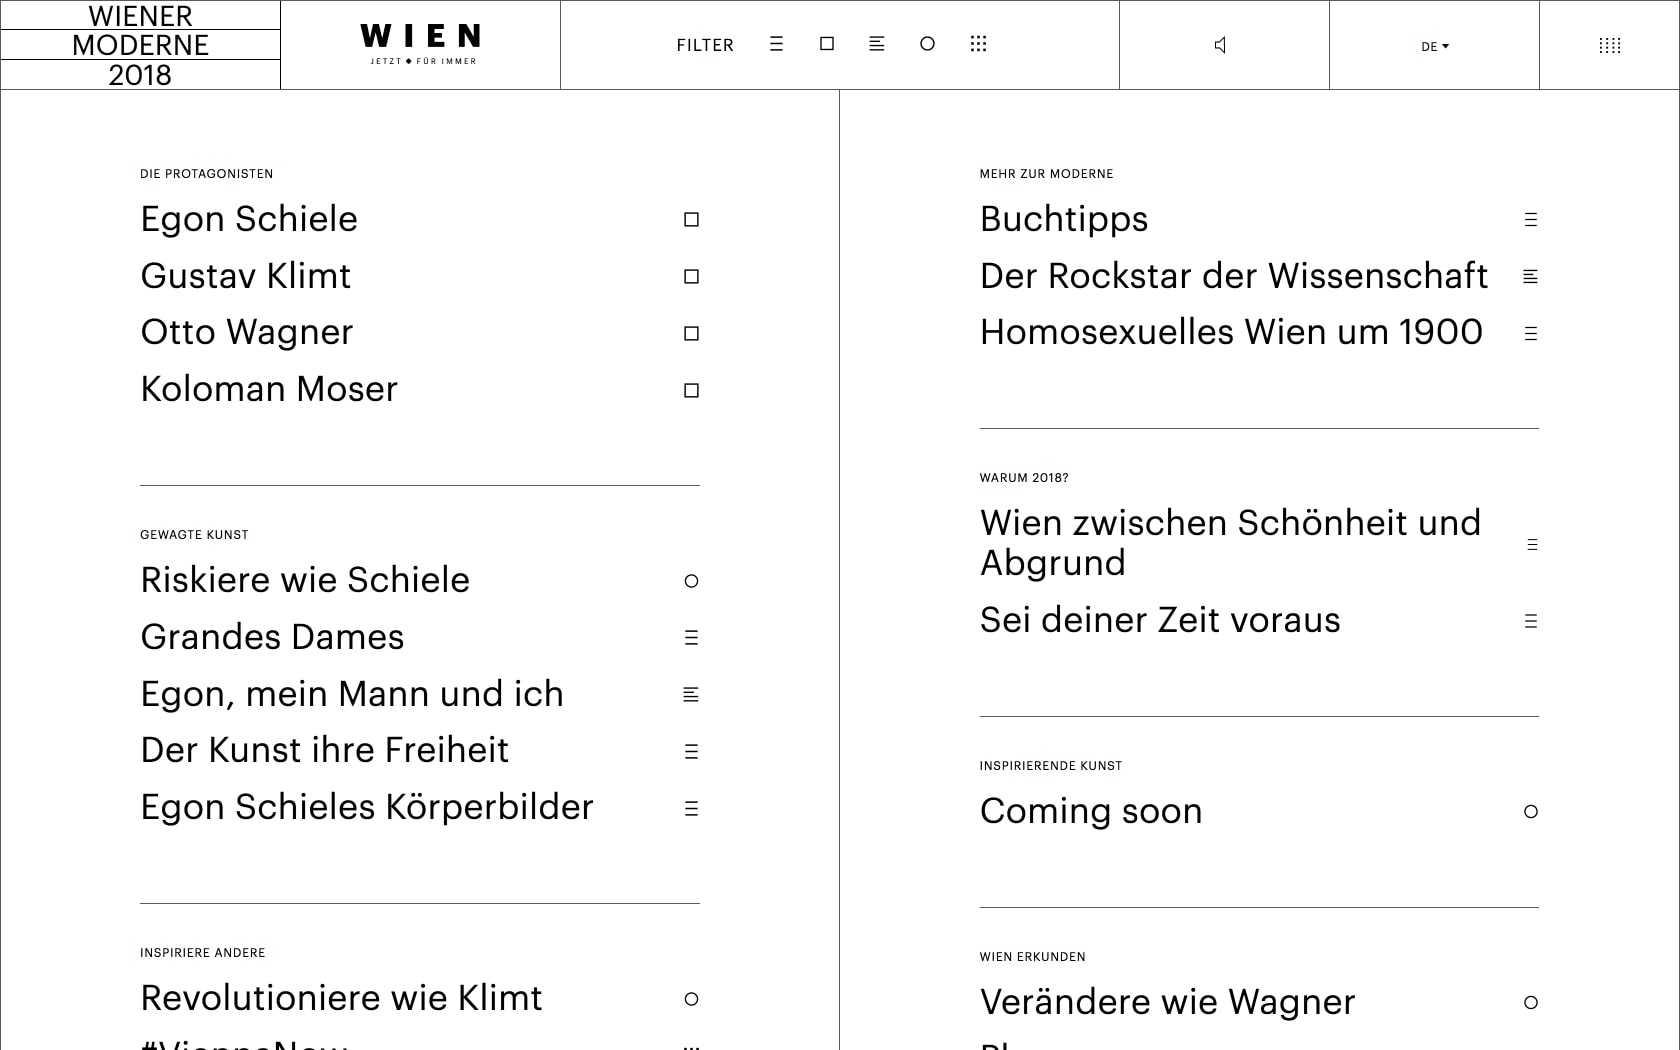 Wiener Moderne 06